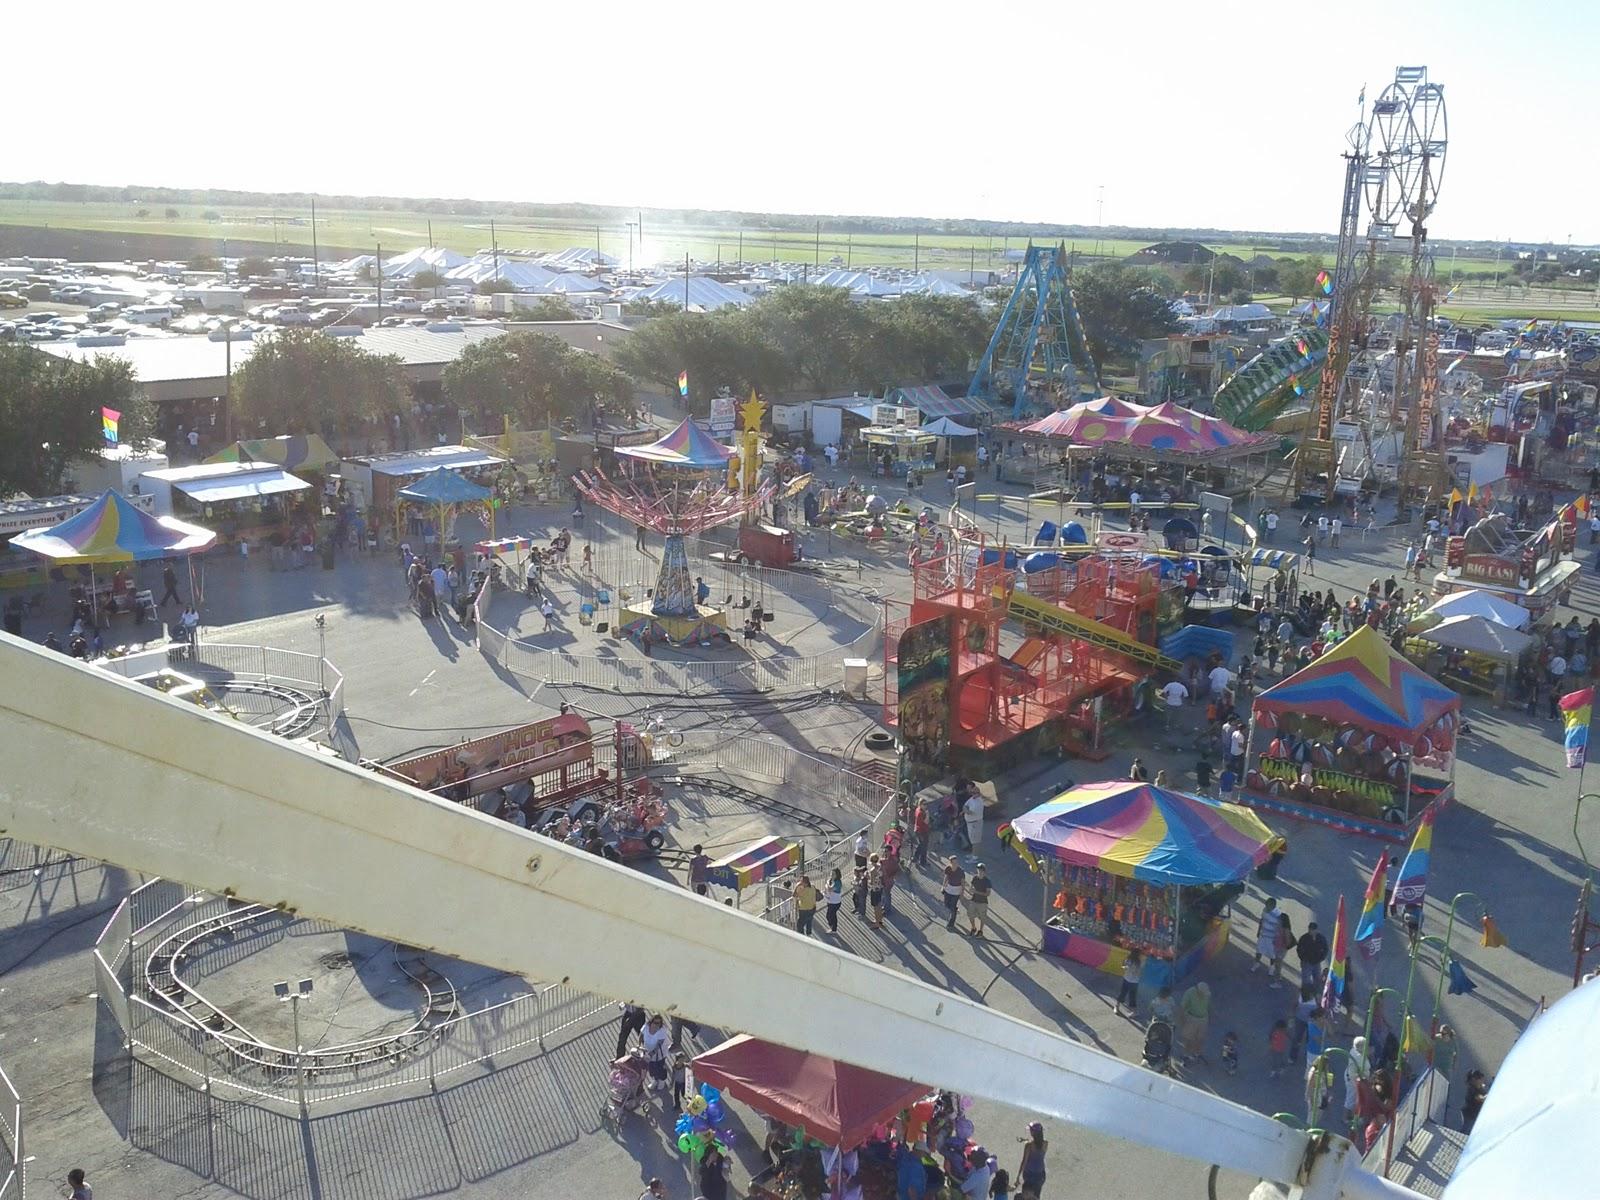 Fort Bend County Fair 2011 - IMG_20111001_174746.jpg